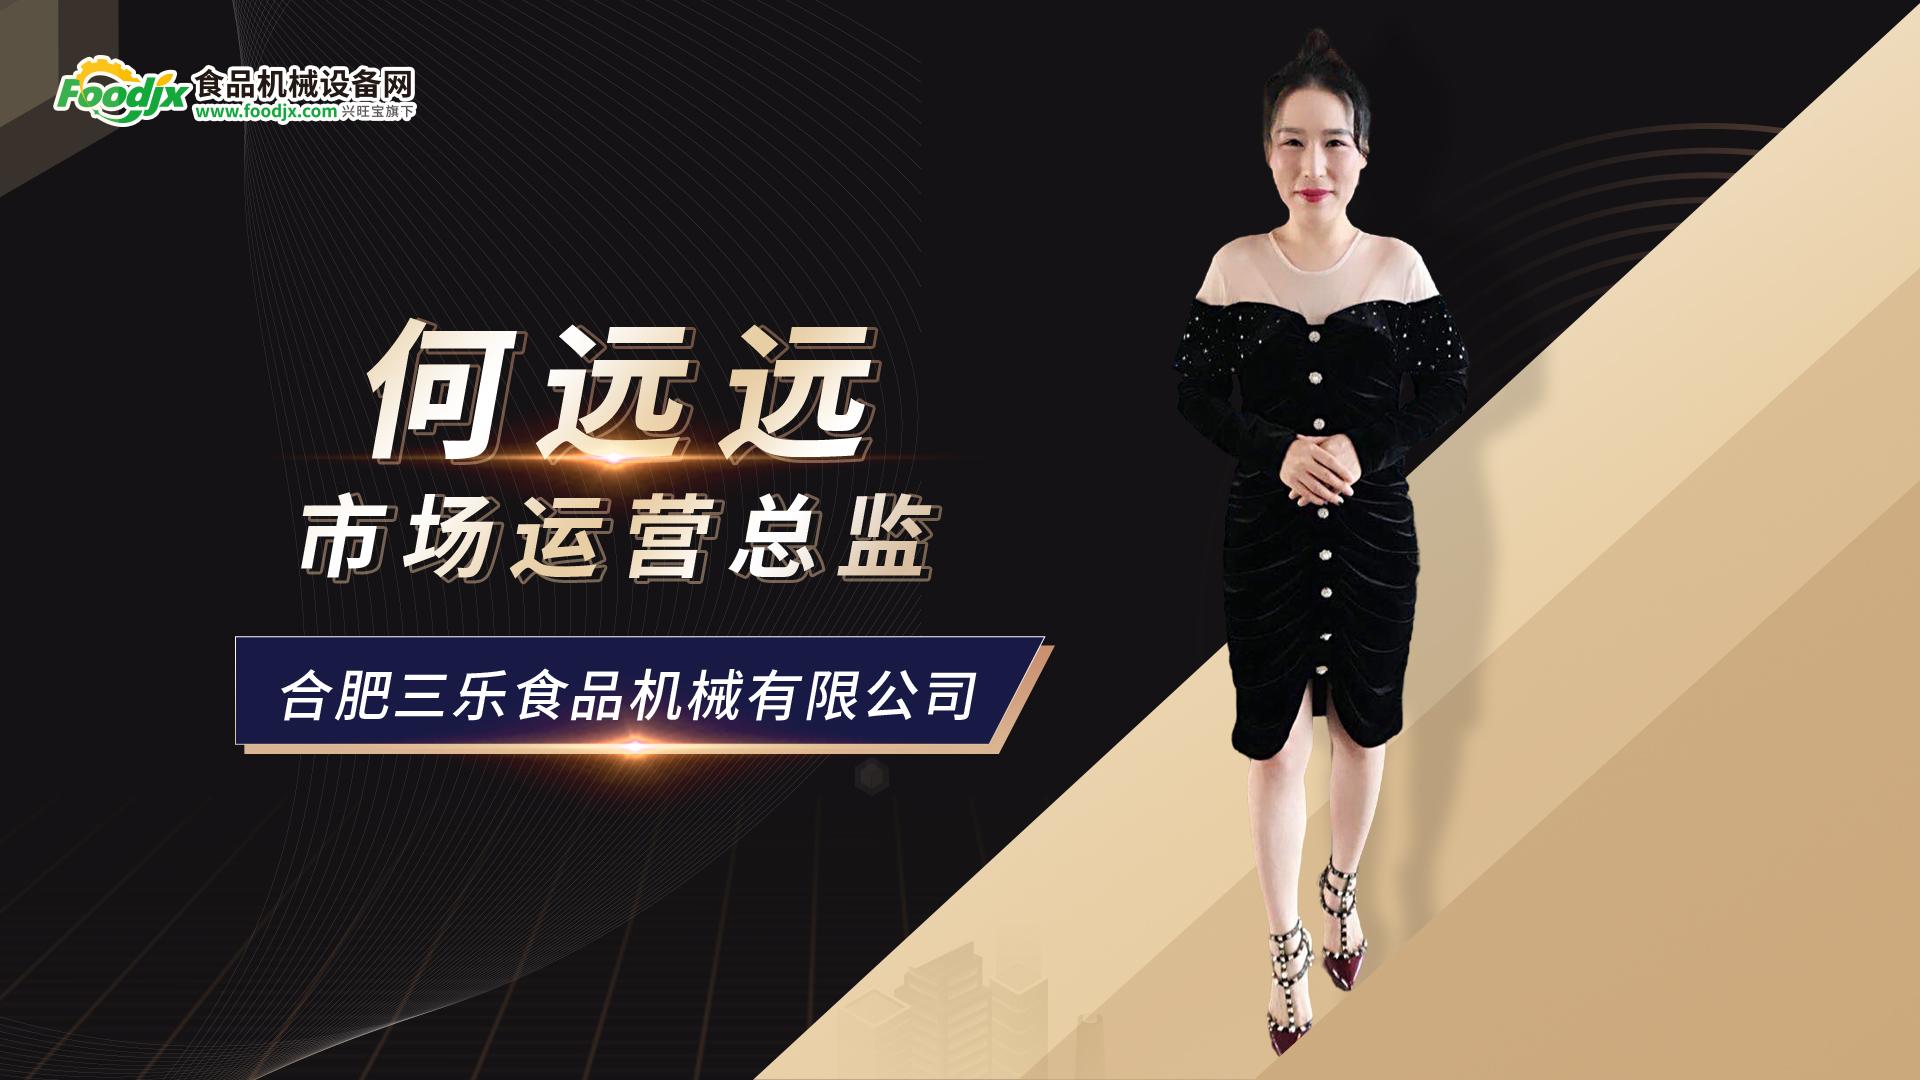 foodjx专访合肥三乐食品机械易胜博娱乐网站